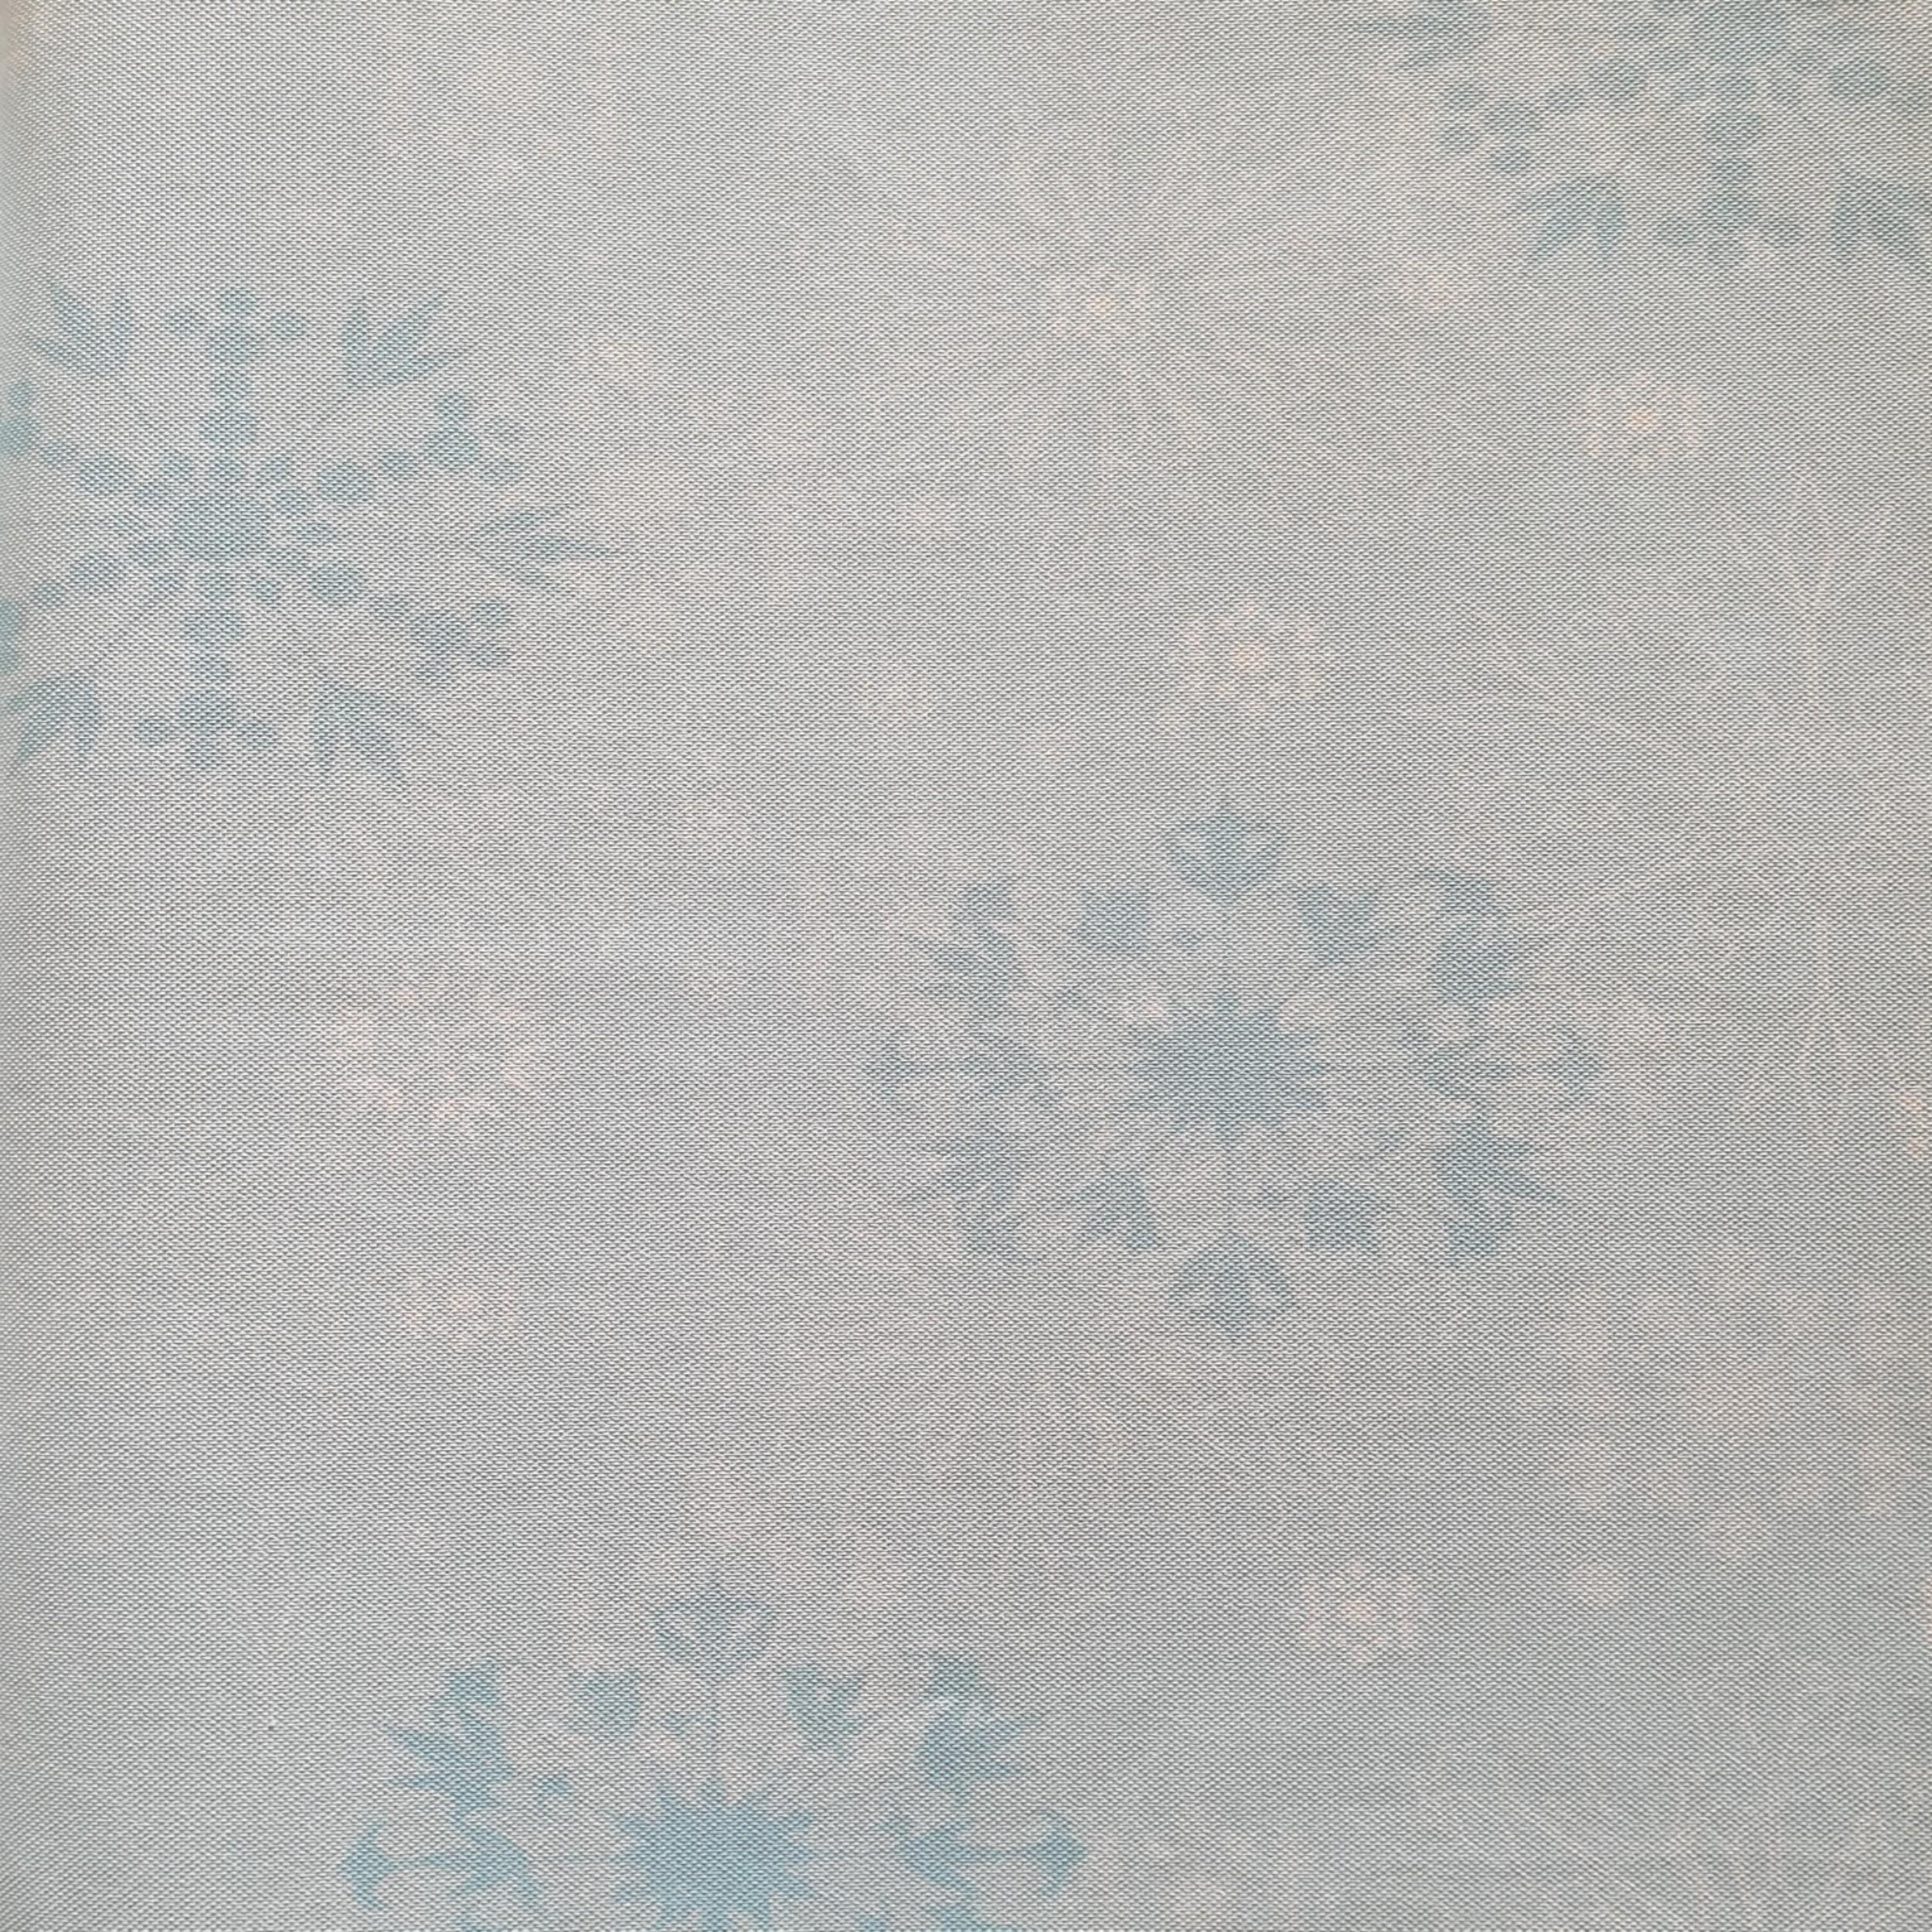 کاغذ دیواری کد B279